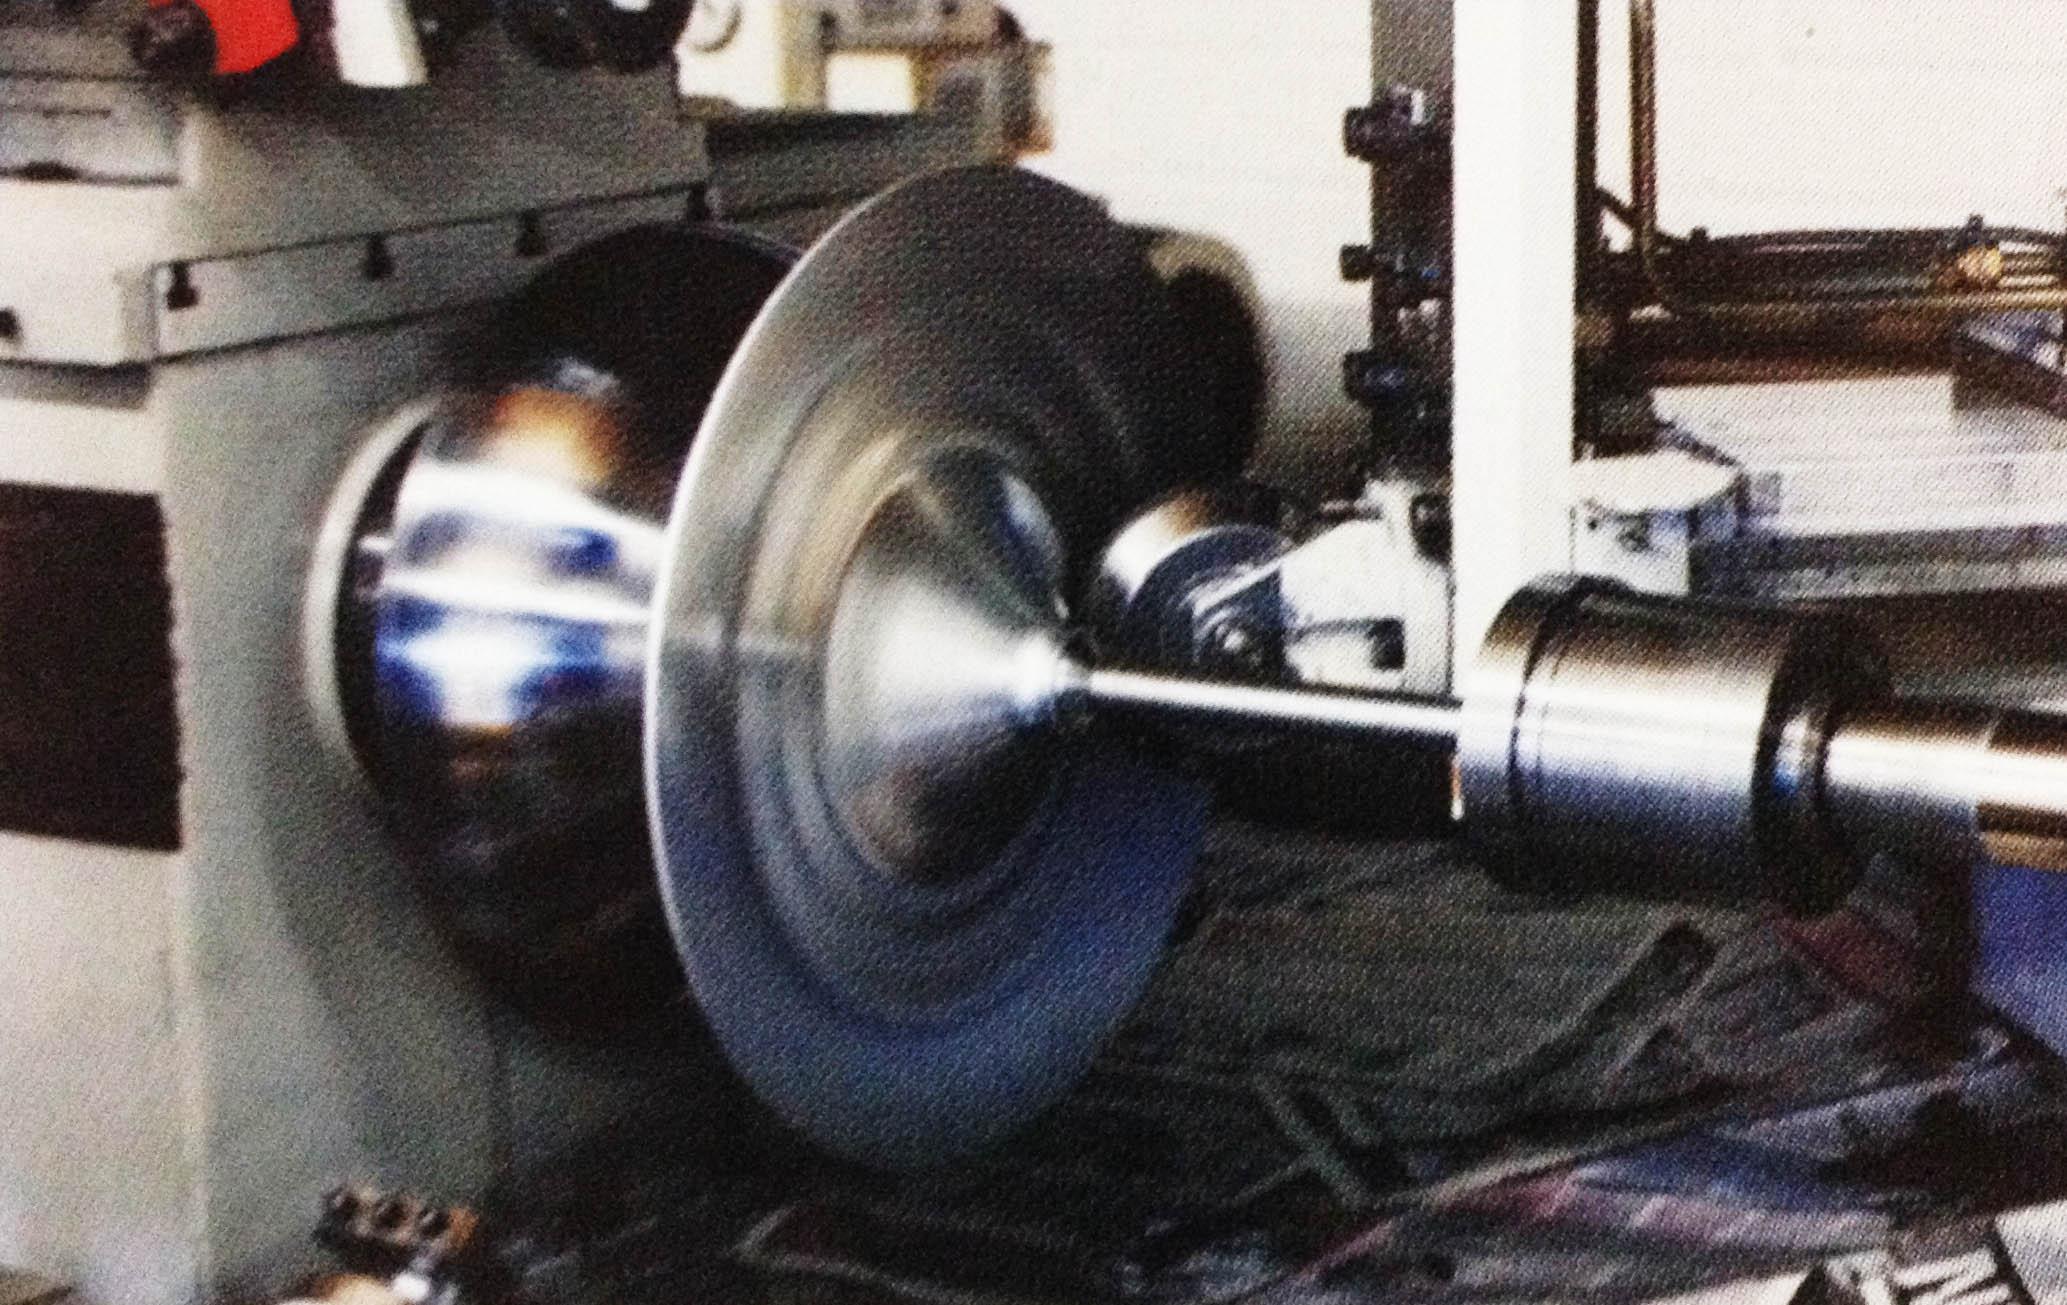 bea862bd5c29624d5015a5d59cd3c81d20150329130728 - What is metal spinning process